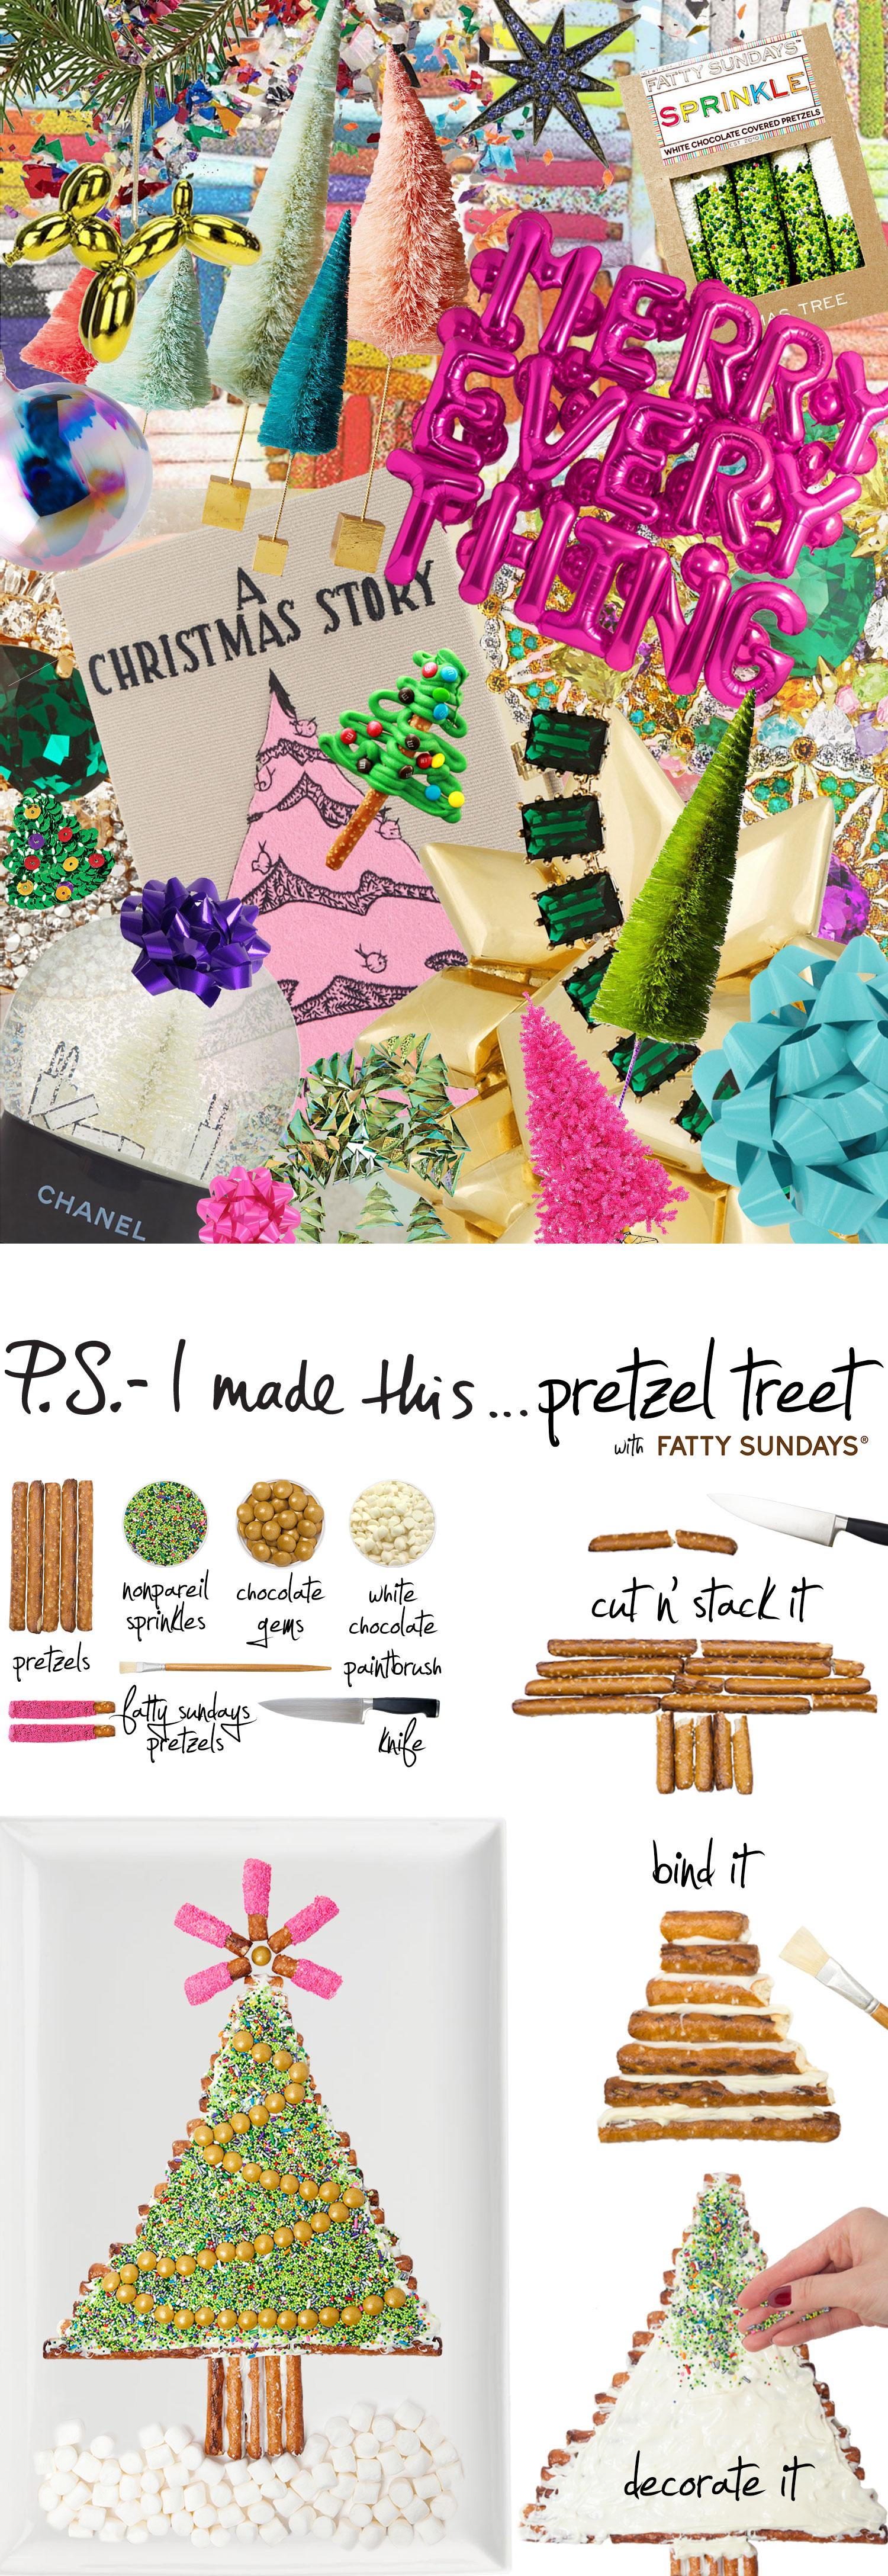 12.22.14_FattySundays_Pretzel-Tree-MERGED